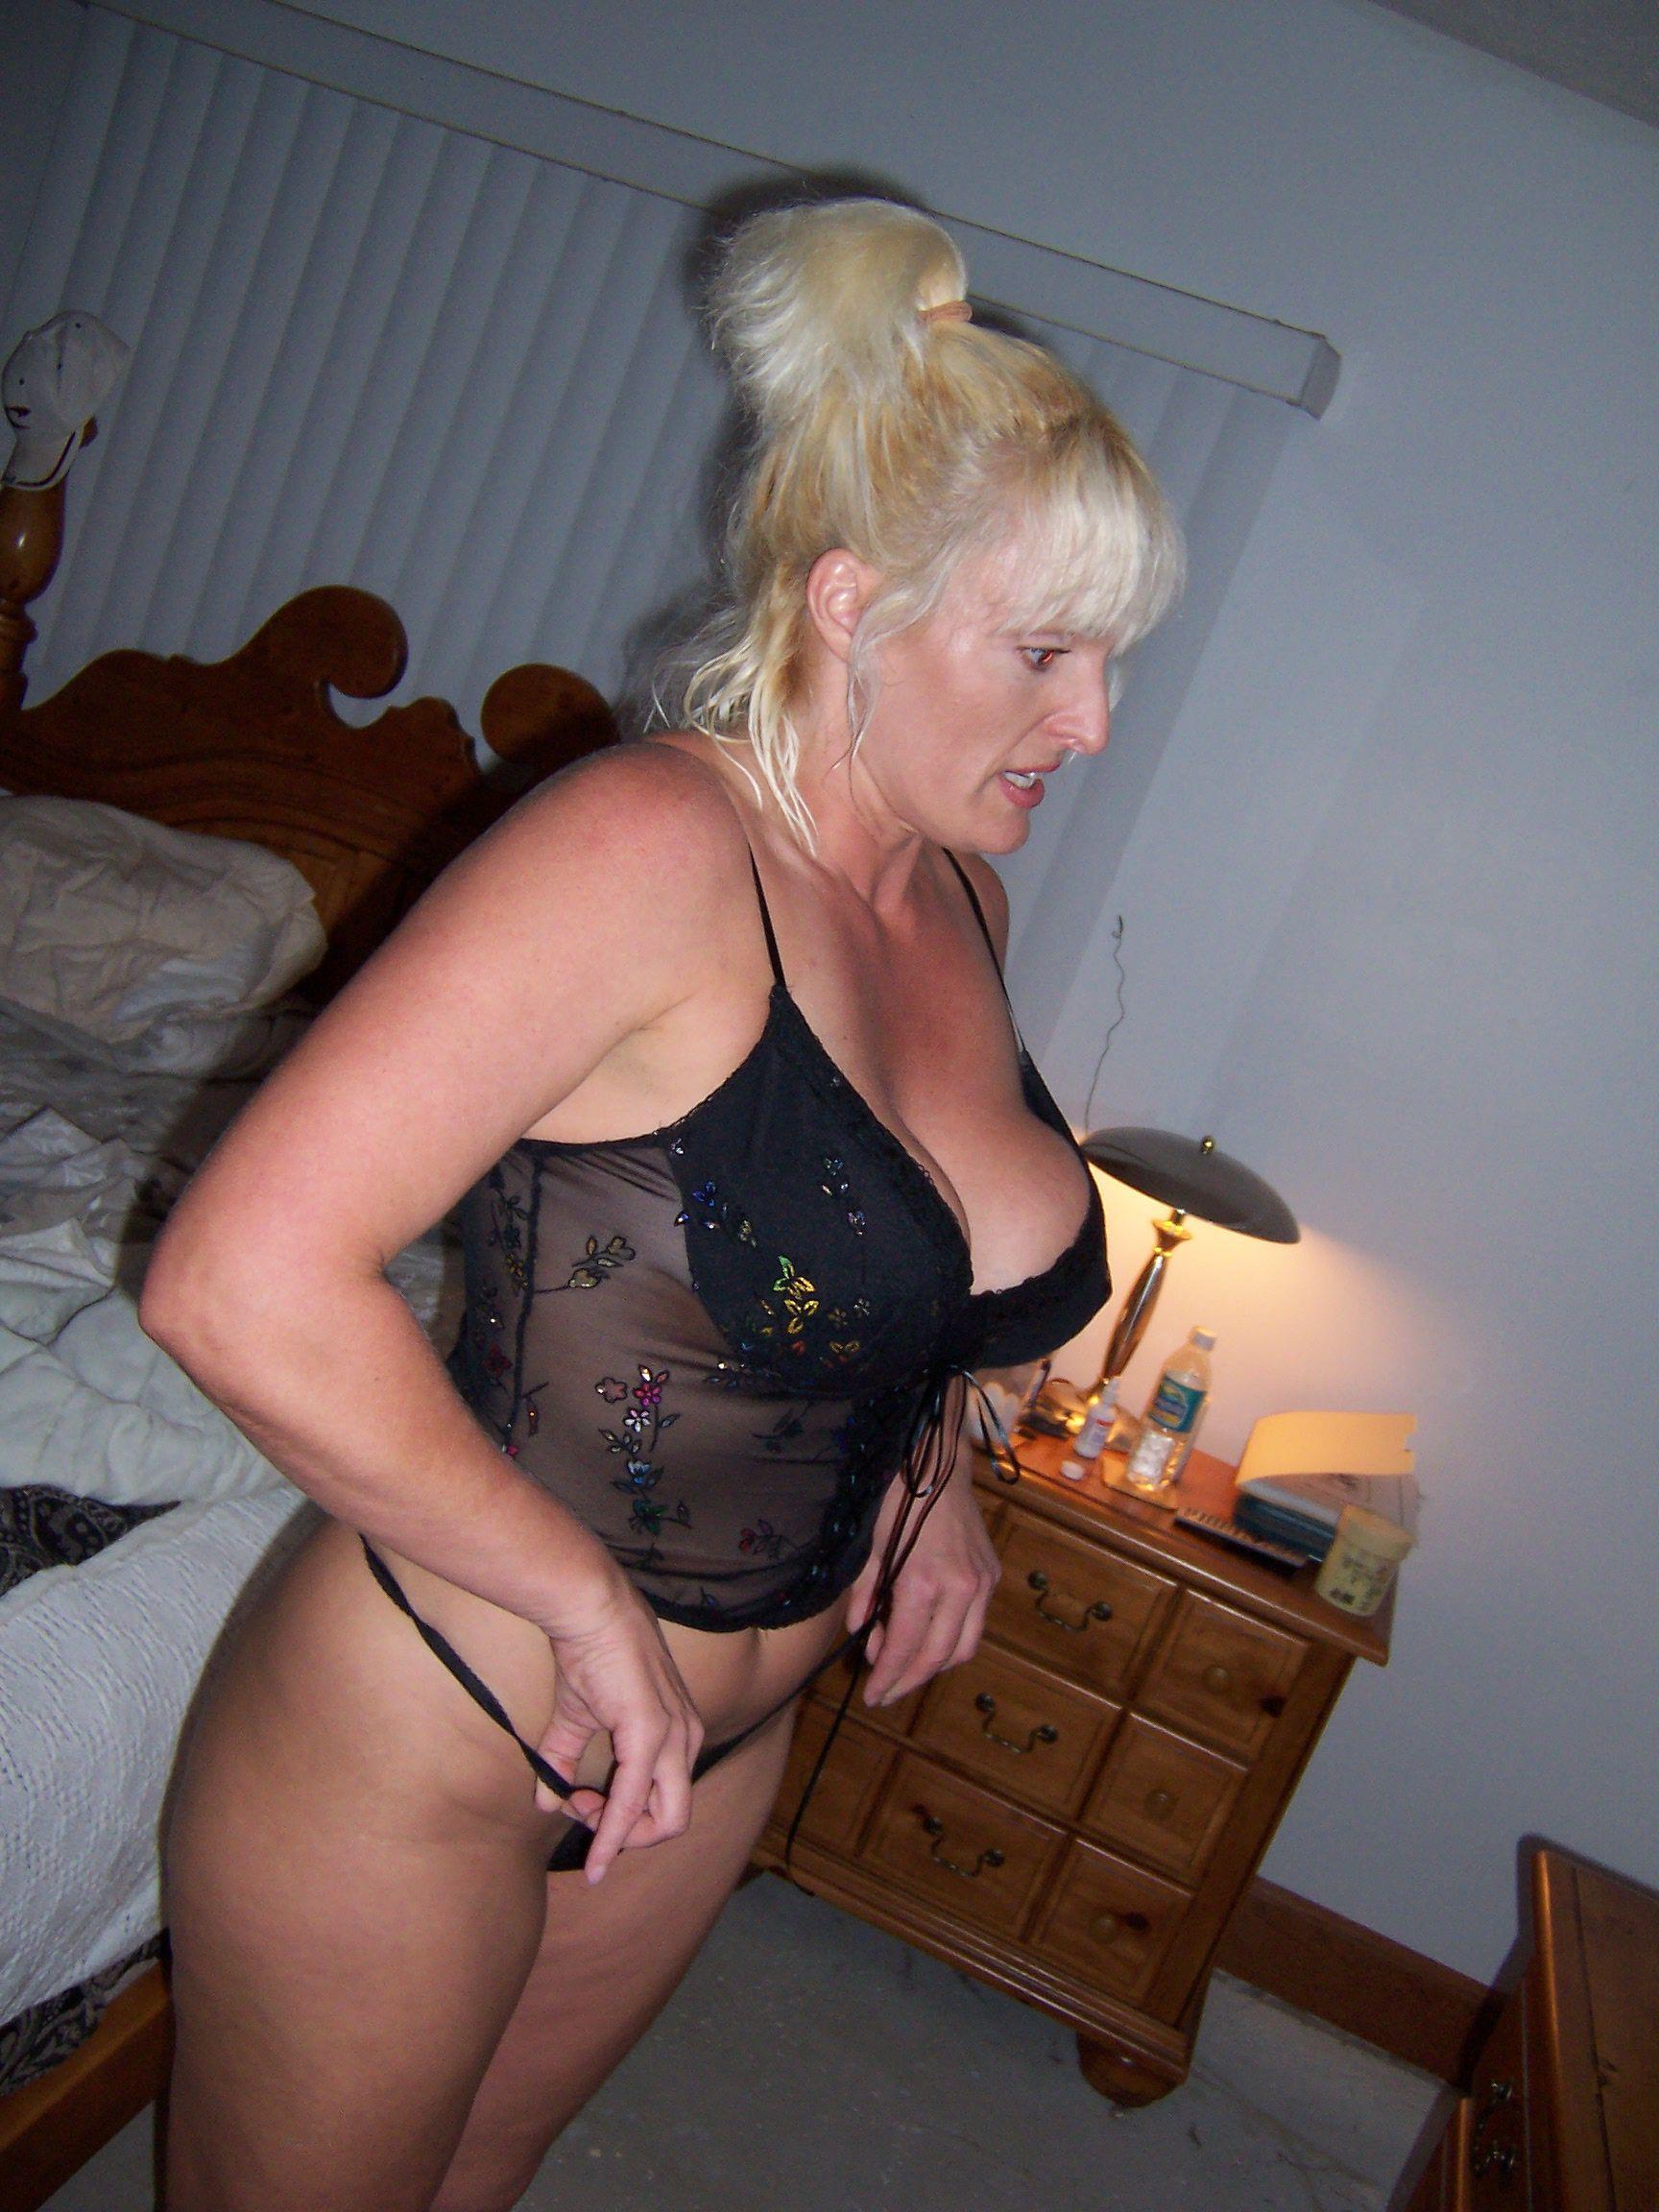 Dicke Brüste